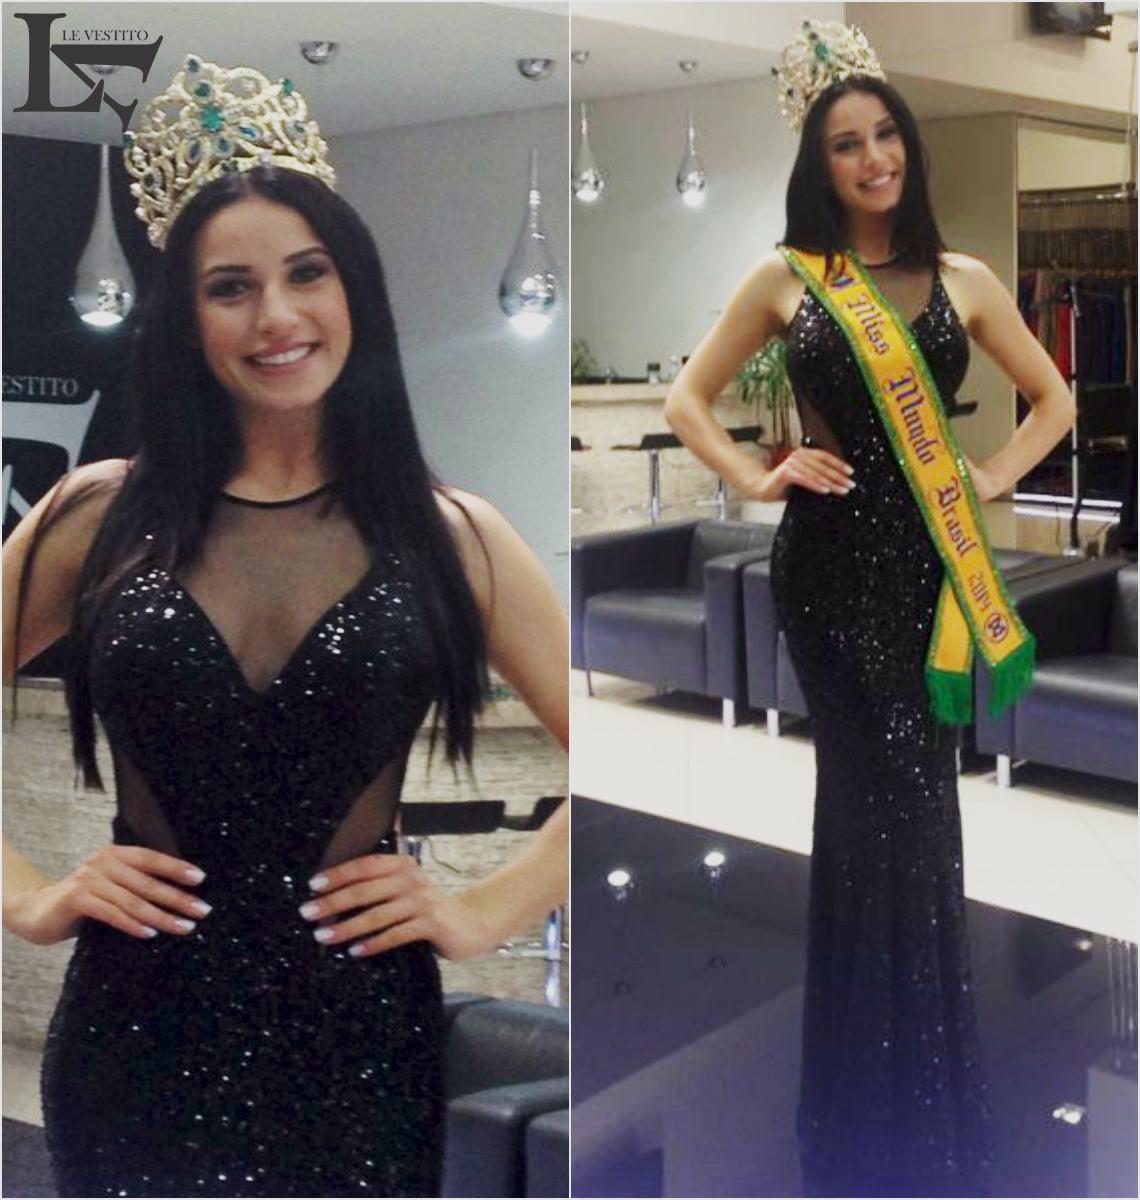 julia gama, miss brasil universo 2020/top 11 de miss world 2014. Wqyq4oap